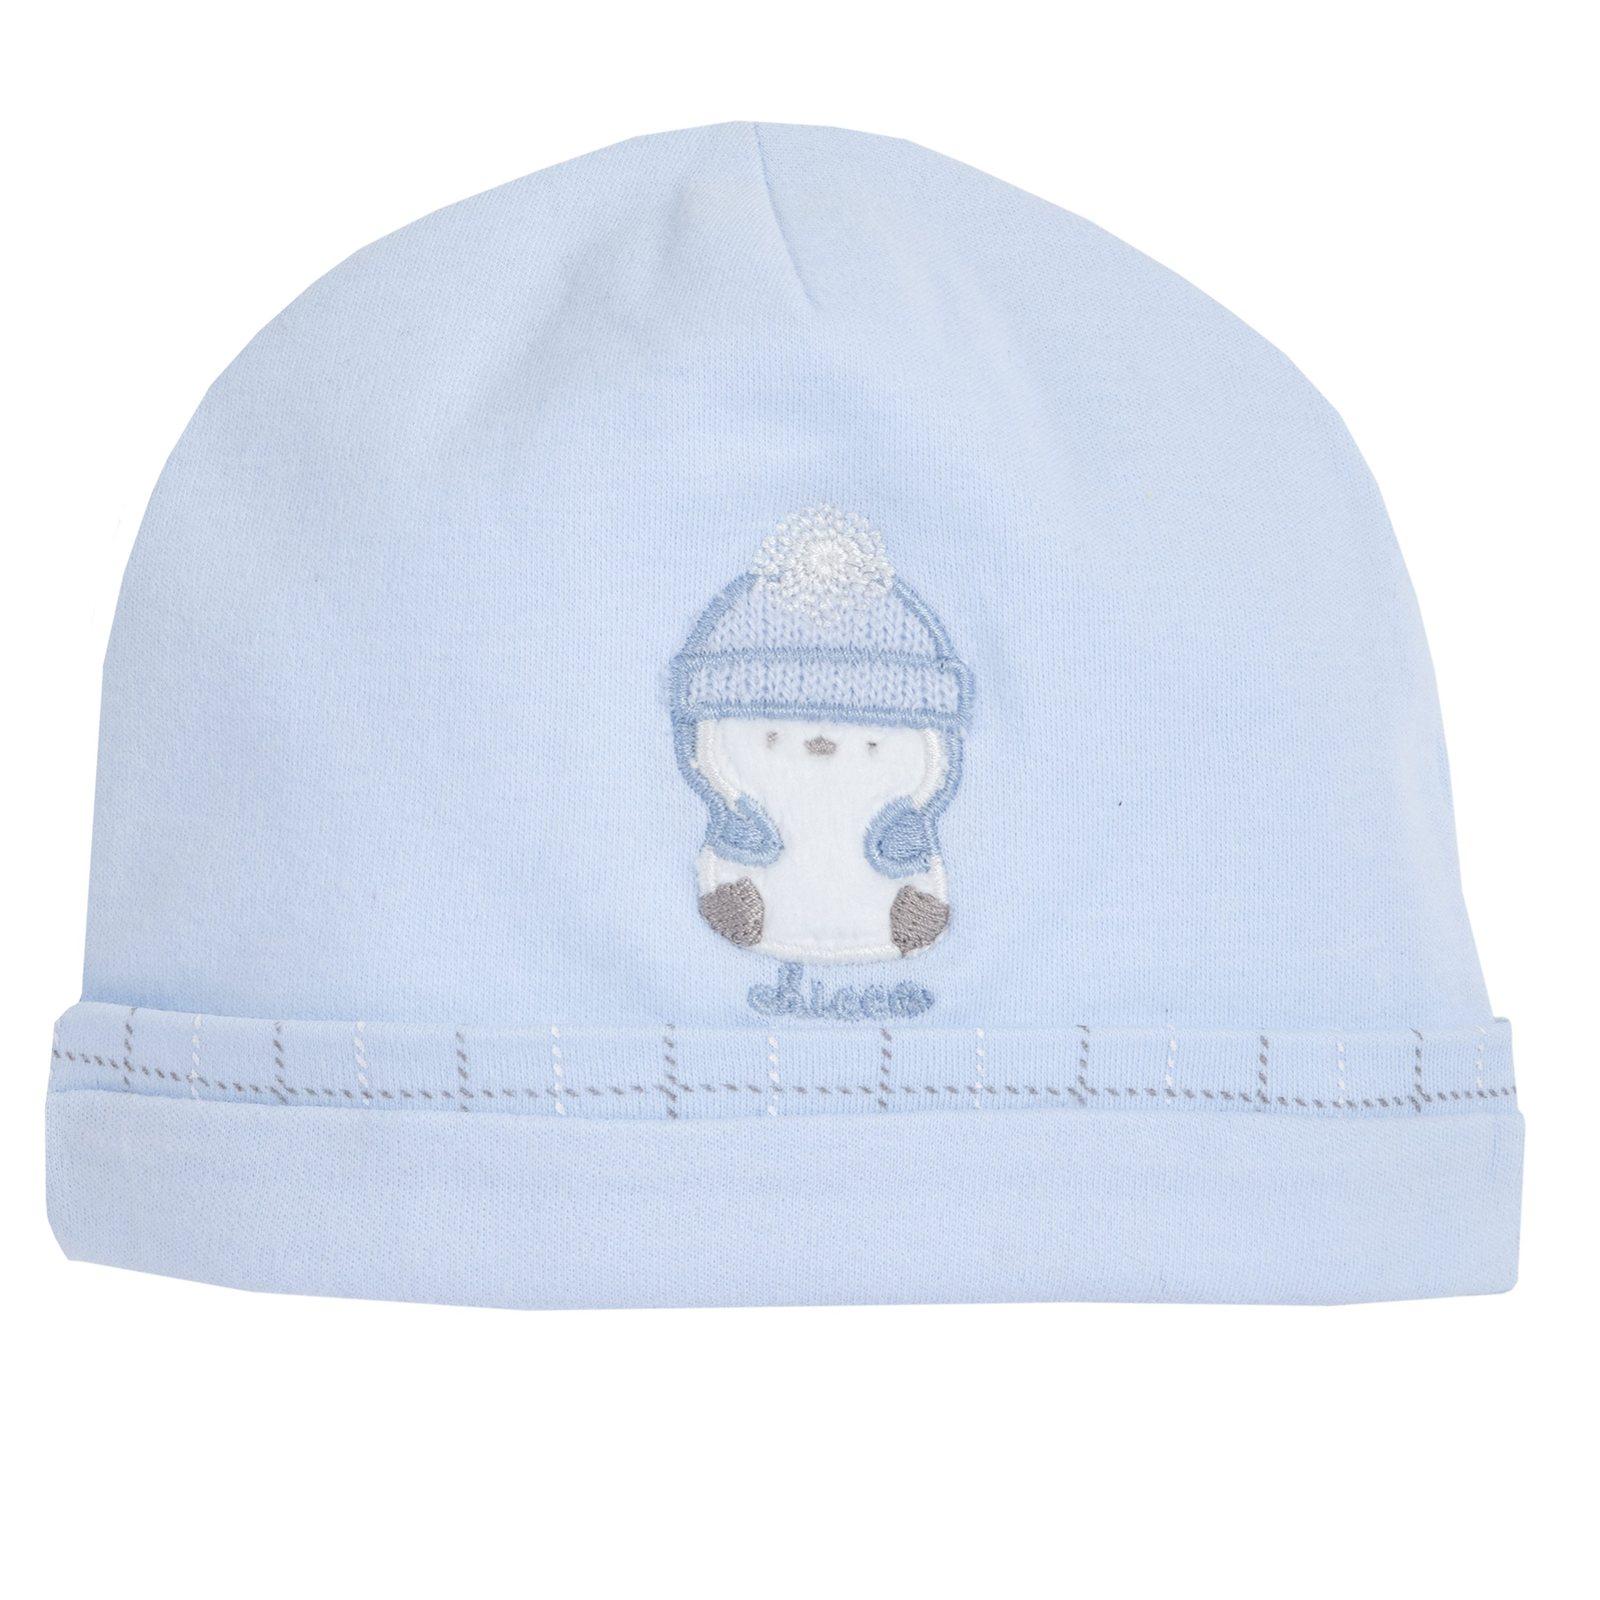 on sale a588a af1d4 Cappello con pinguino